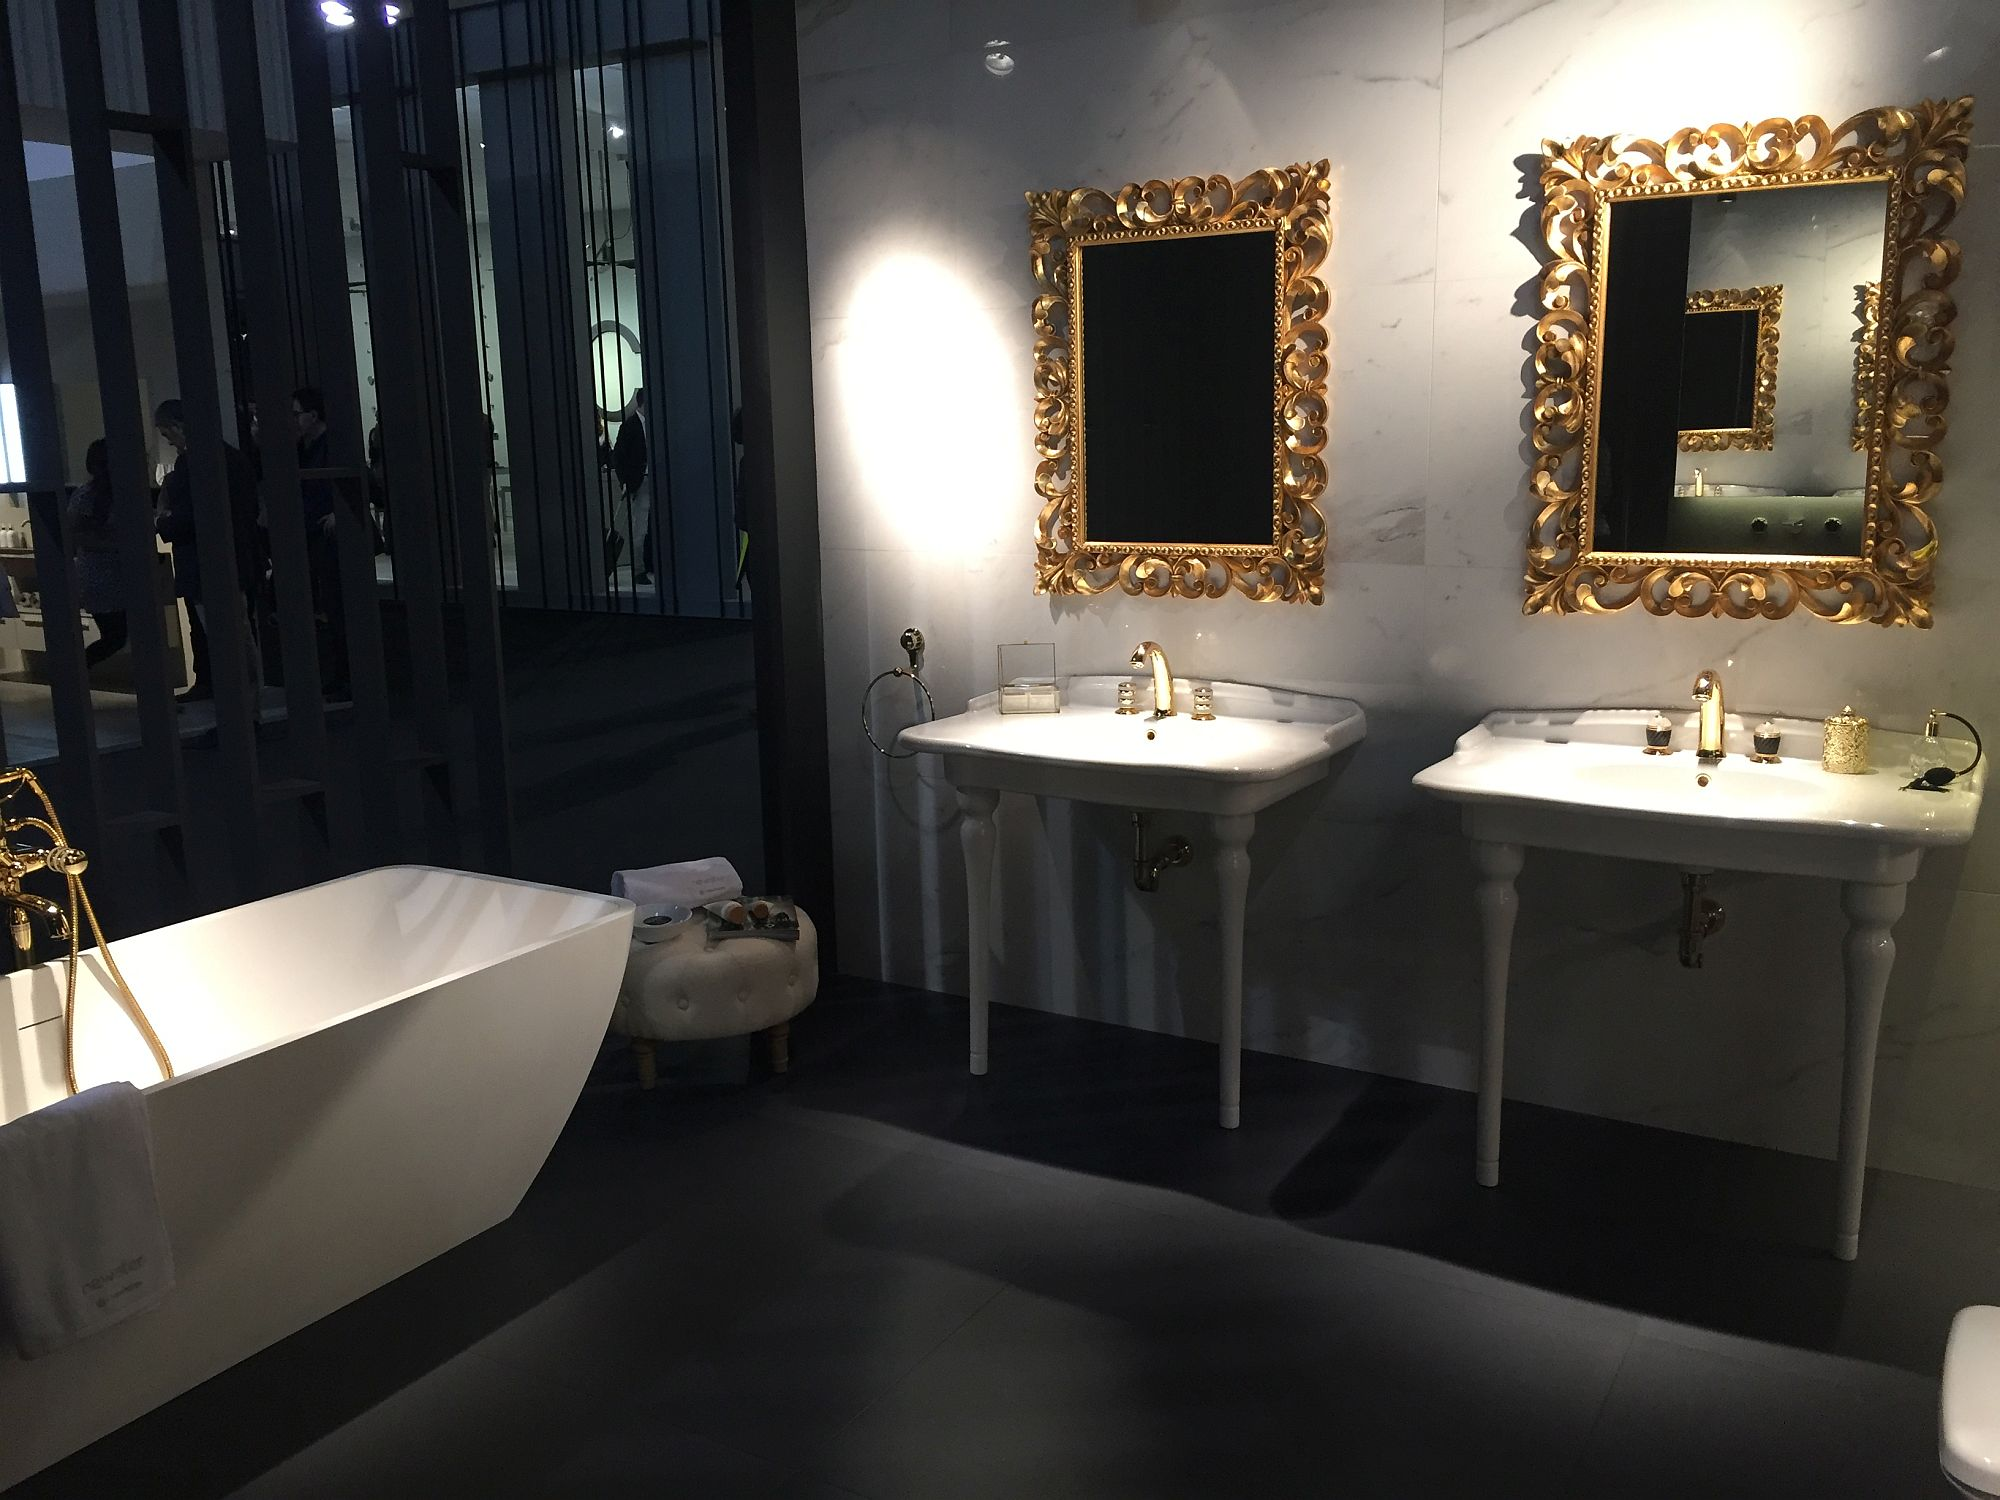 Modern Bathrooms Setting Ideas: 20 Towel Display Ideas For Contemporary Bathrooms